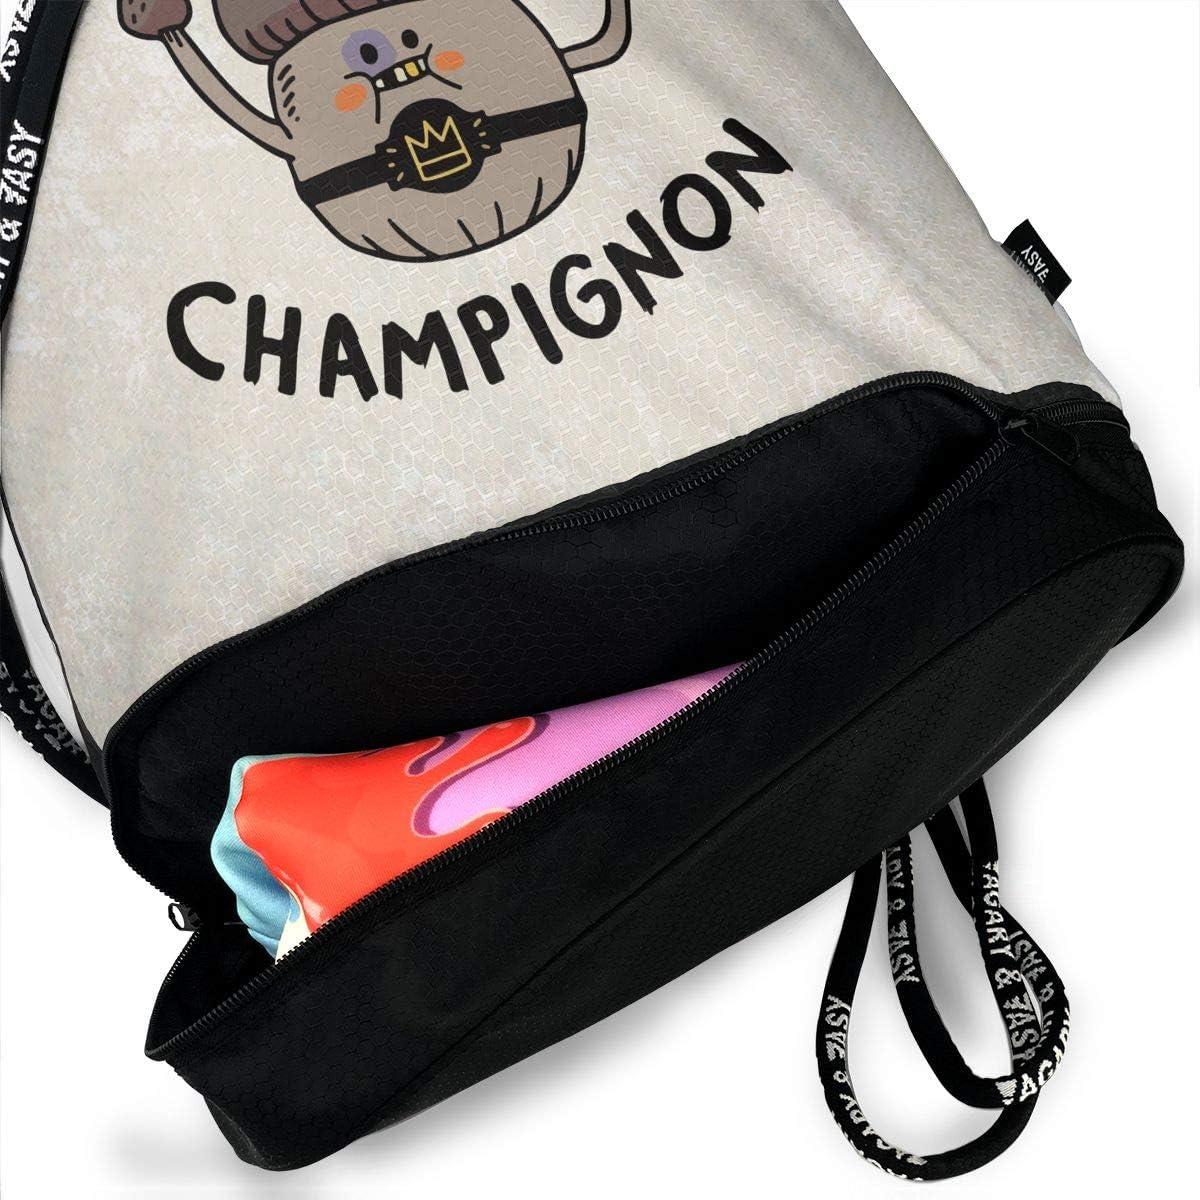 HUOPR5Q Heavyweight Champignon Drawstring Backpack Sport Gym Sack Shoulder Bulk Bag Dance Bag for School Travel